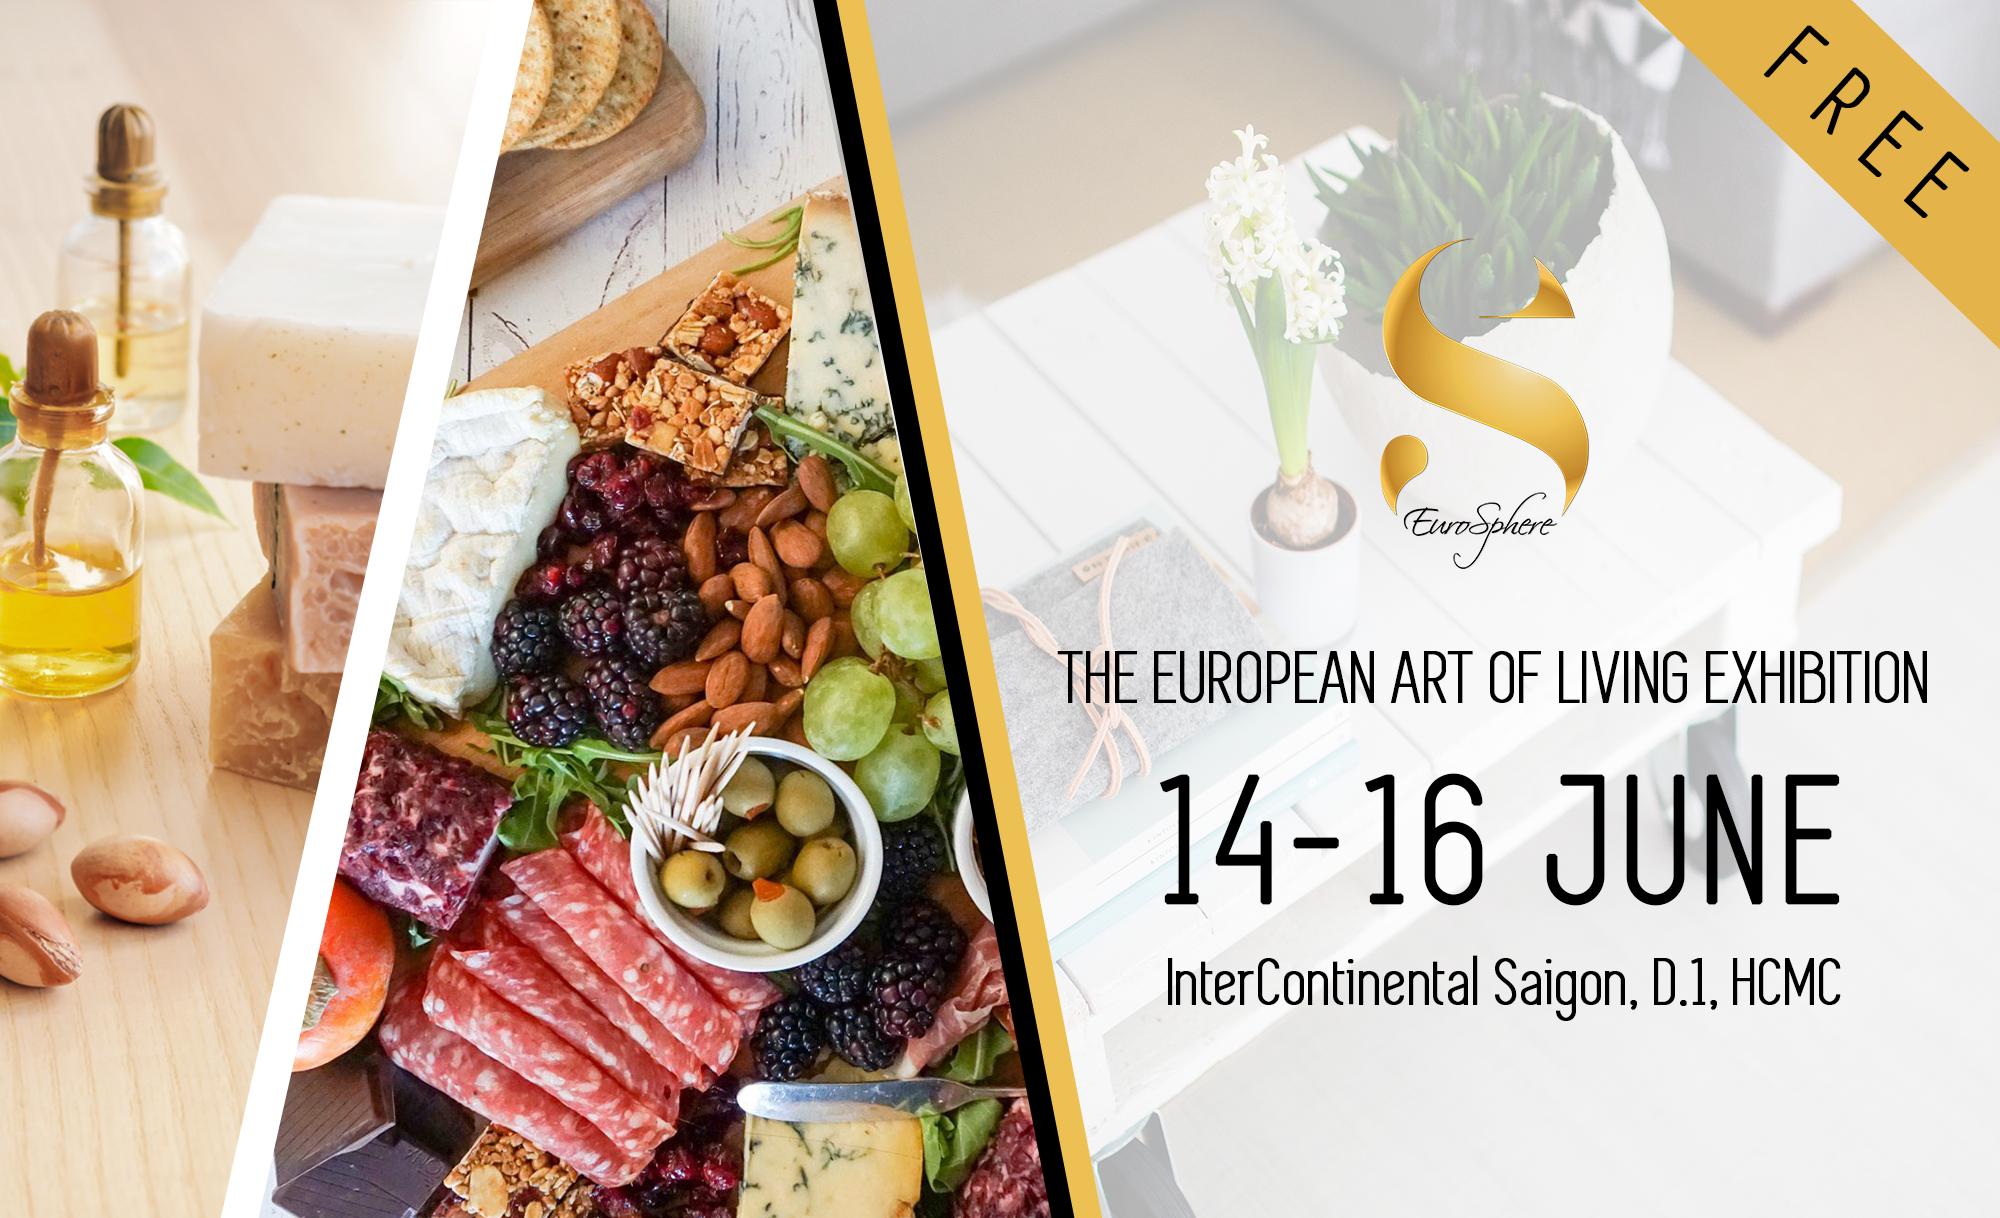 EuroSphere 2019 – The European Art of Living Exhibition in HCMC